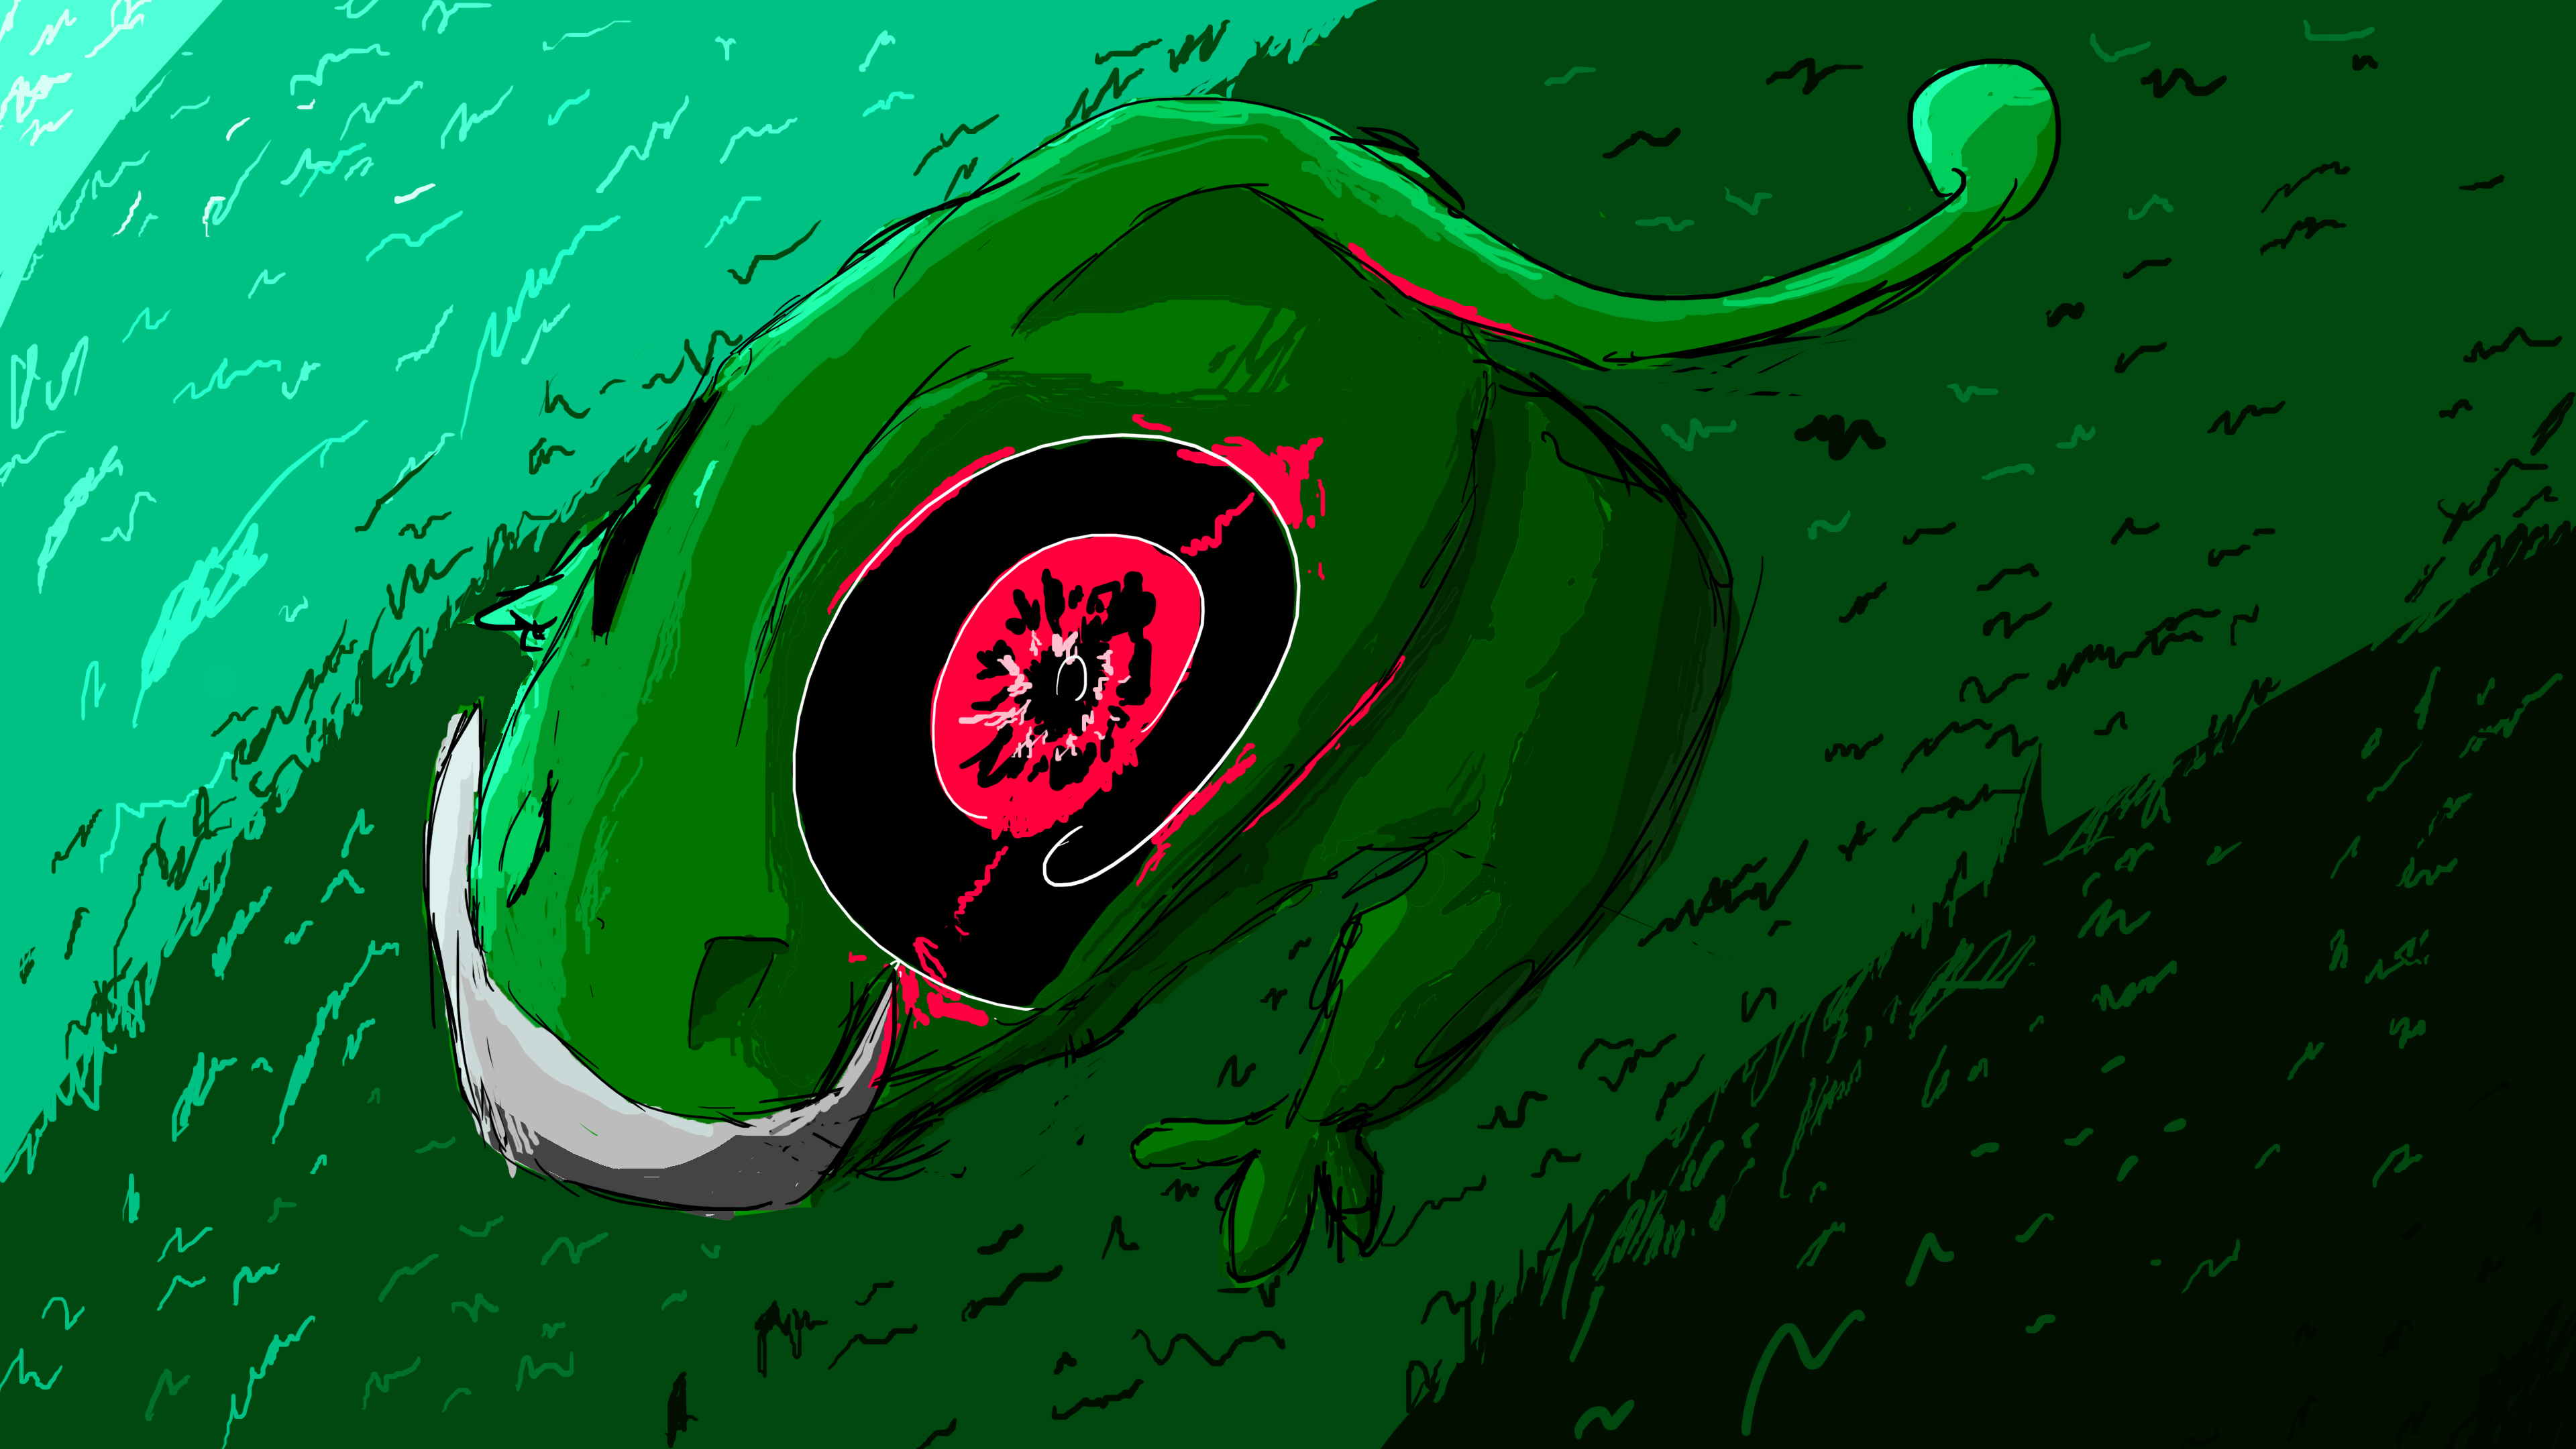 The Elusive Handless Cannibal Frog